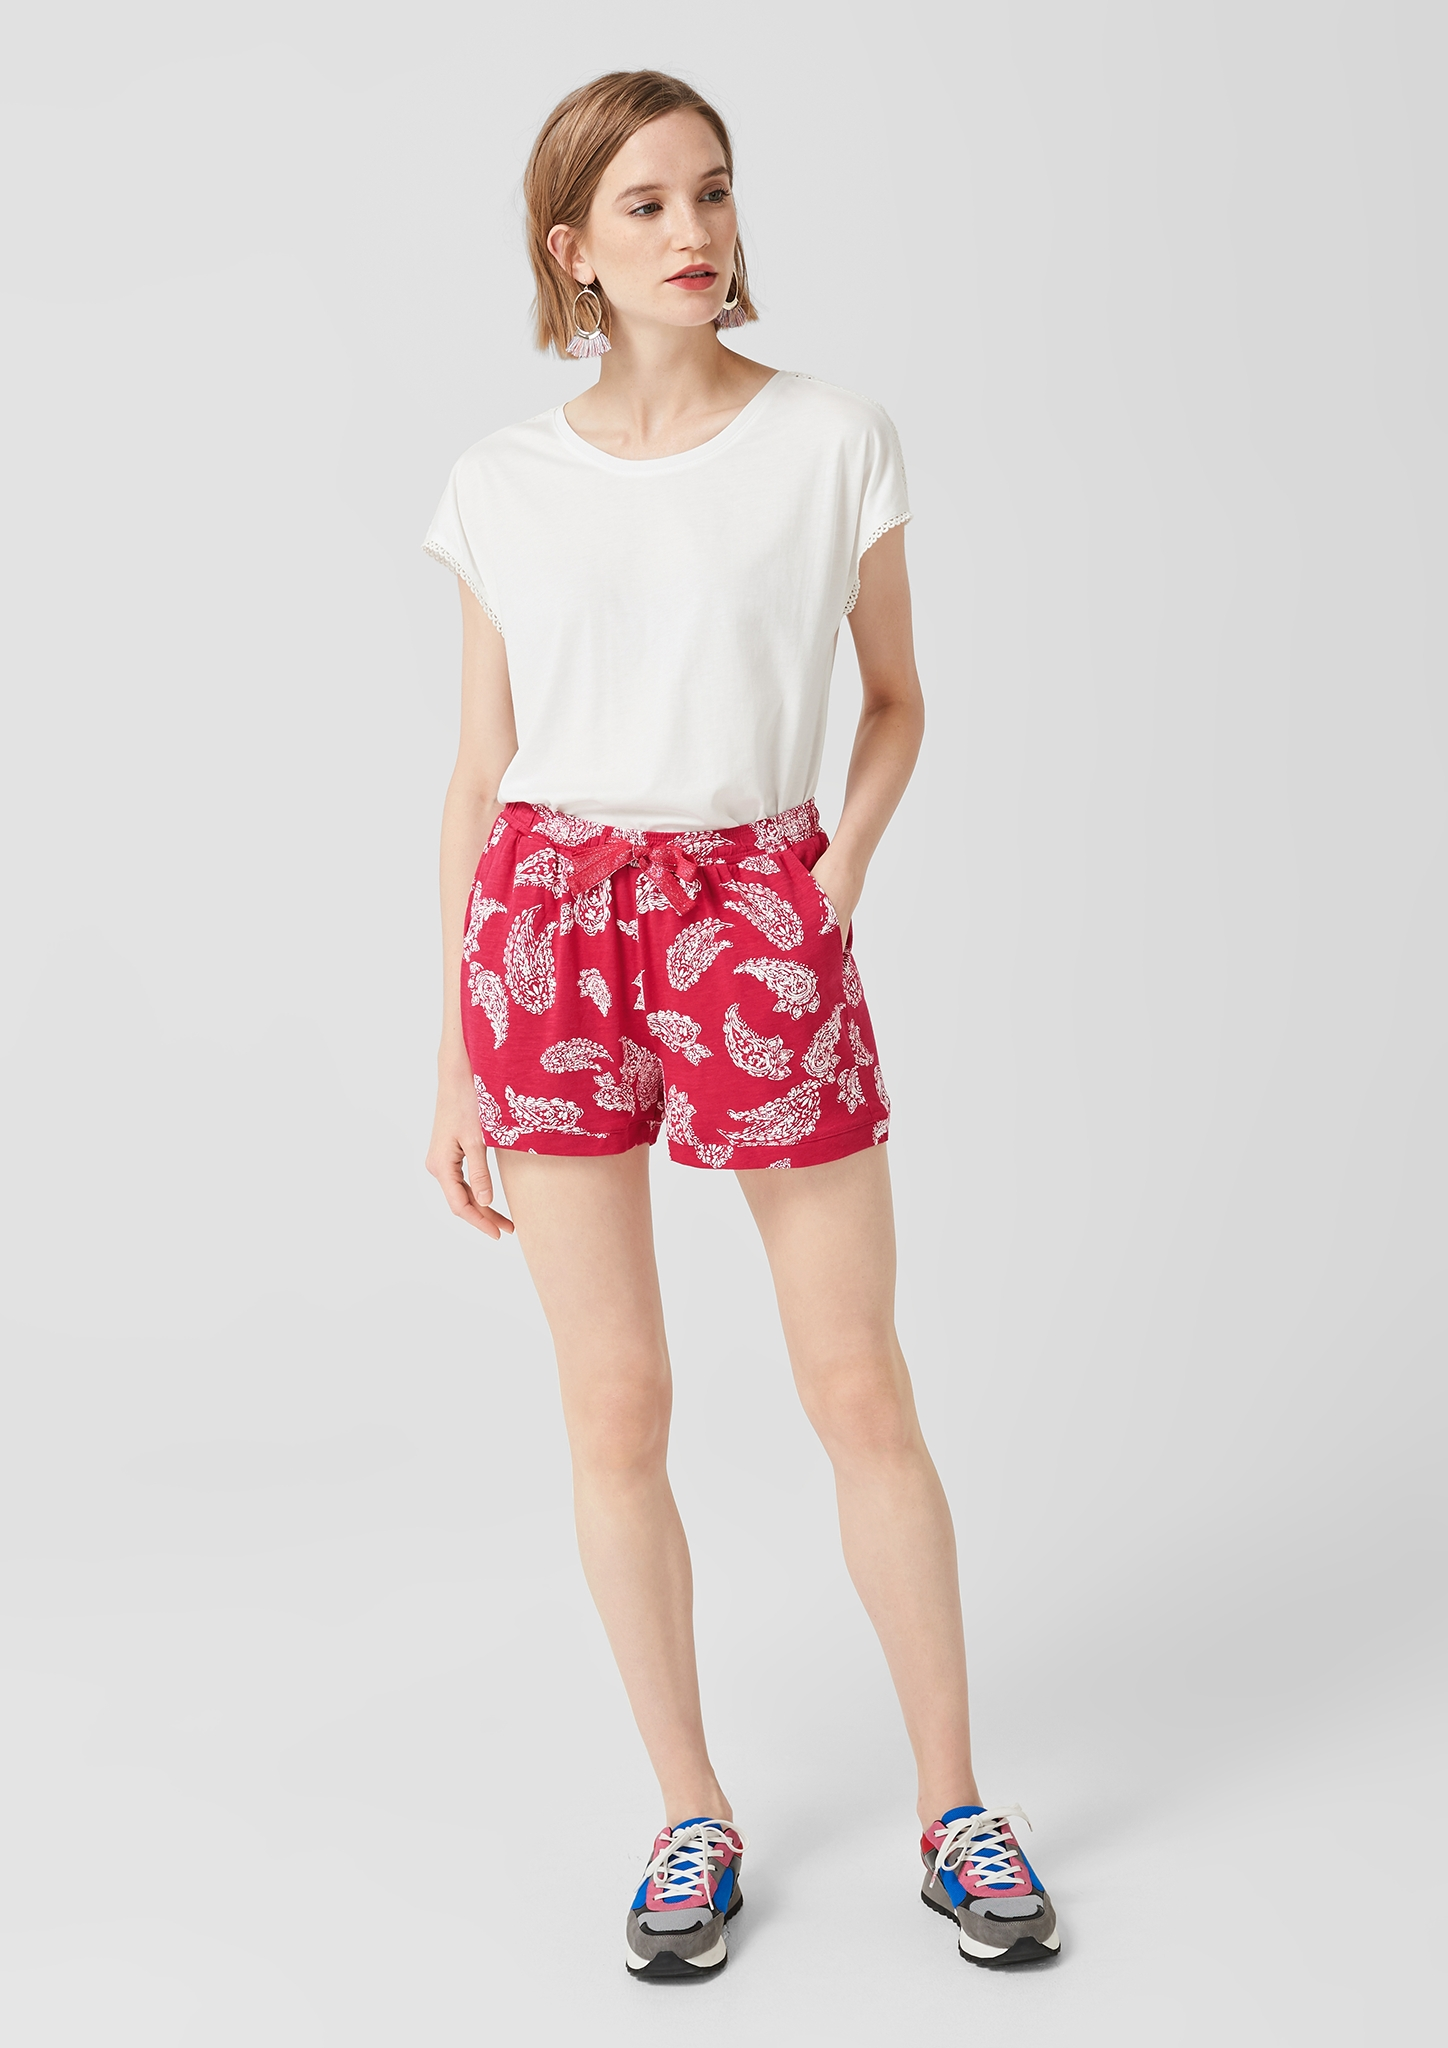 s-Oliver-Casual-Women-Jerseyshorts-mit-Musterprint-Neu Indexbild 18